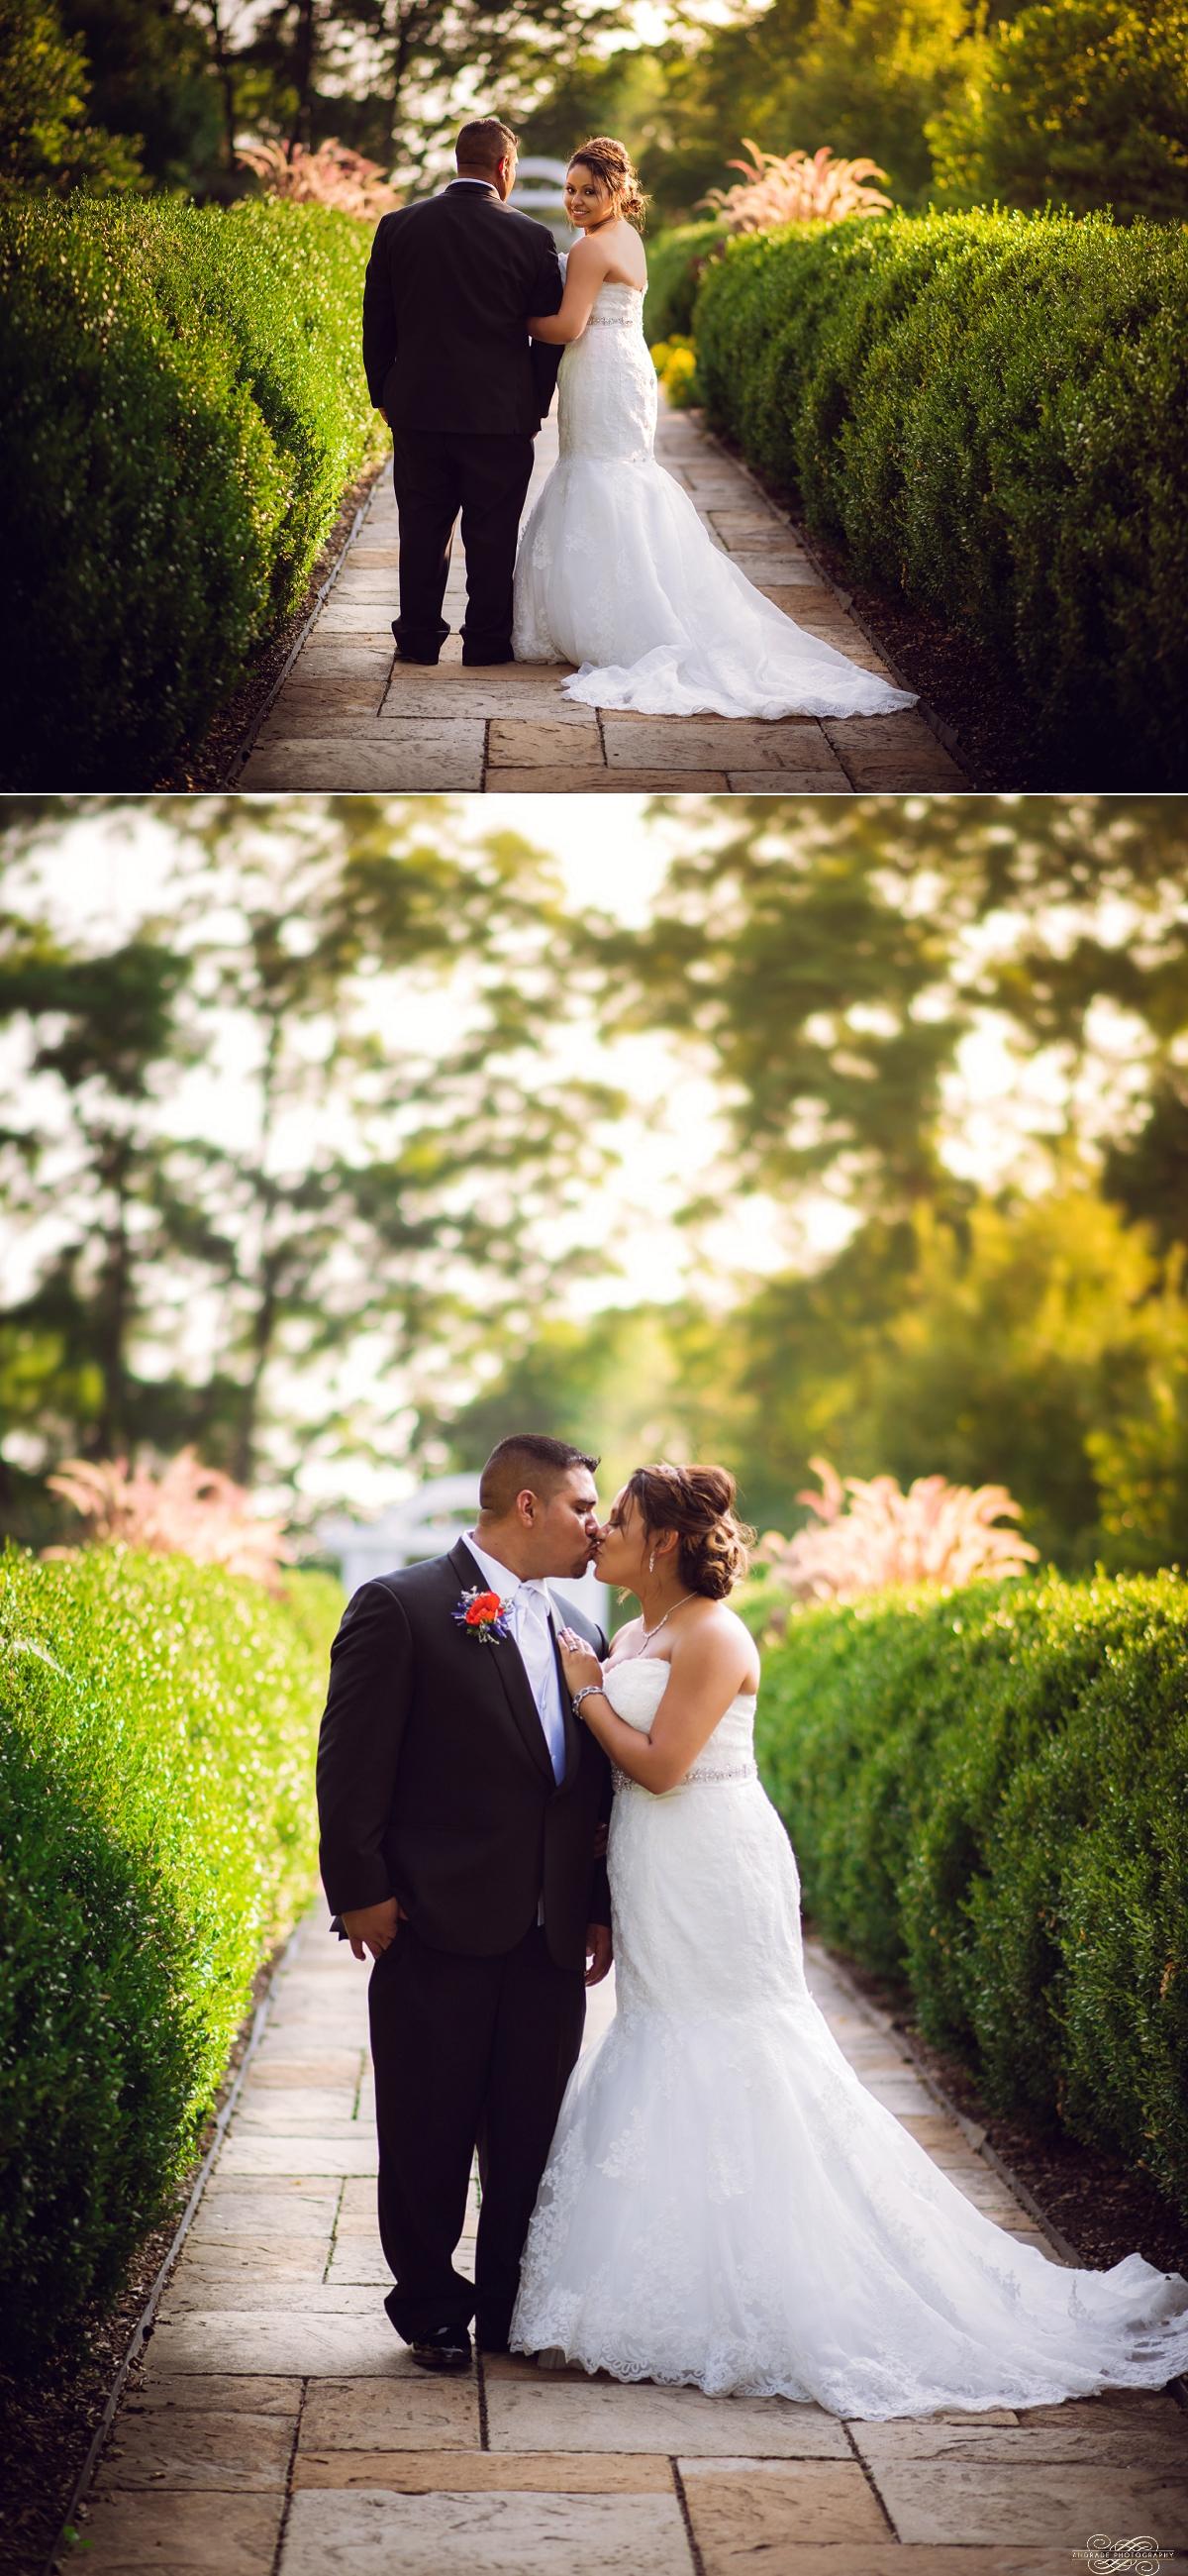 Janette + Louie Estebans Wedding Photography in Naperville - Naperville Wedding Photographer_0059.jpg